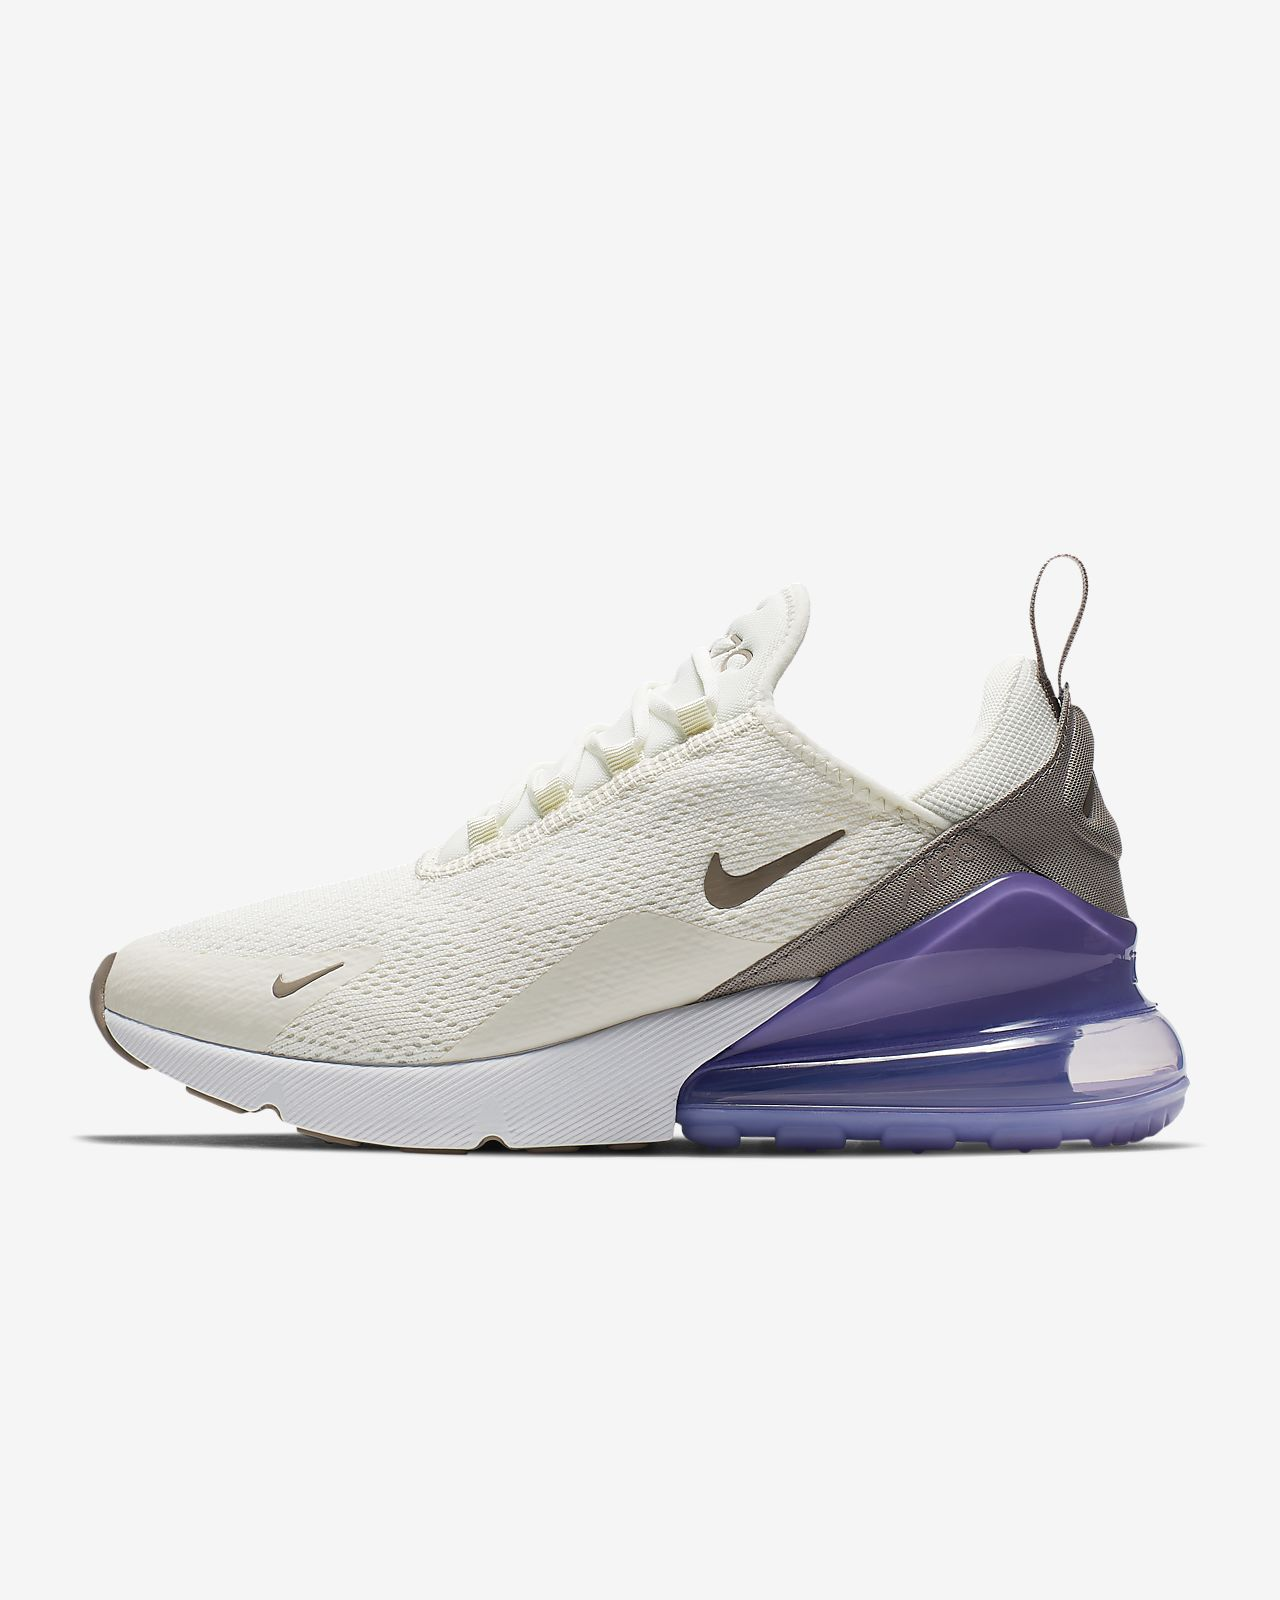 innovative design e9f75 5b7e7 ... Chaussure Nike Air Max 270 pour Femme